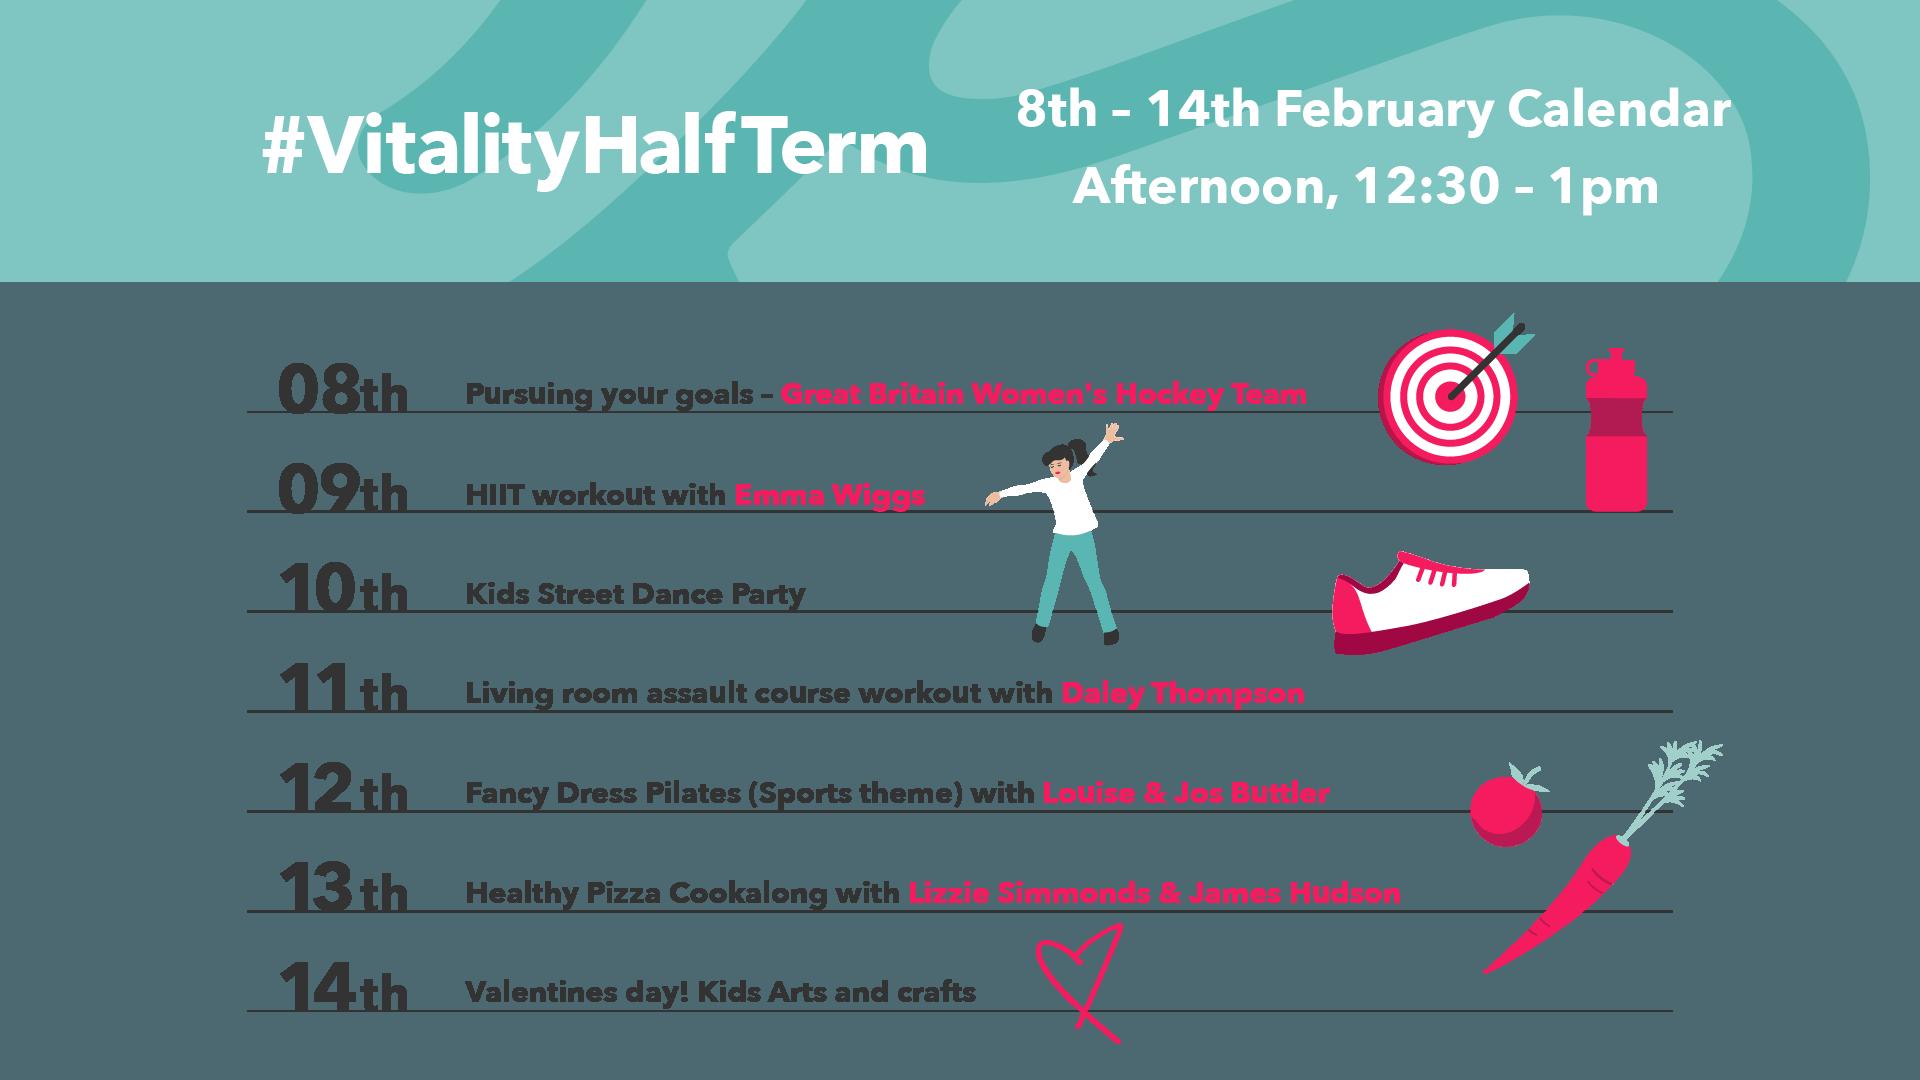 Vitality Half Term Calendar of Events Week 1